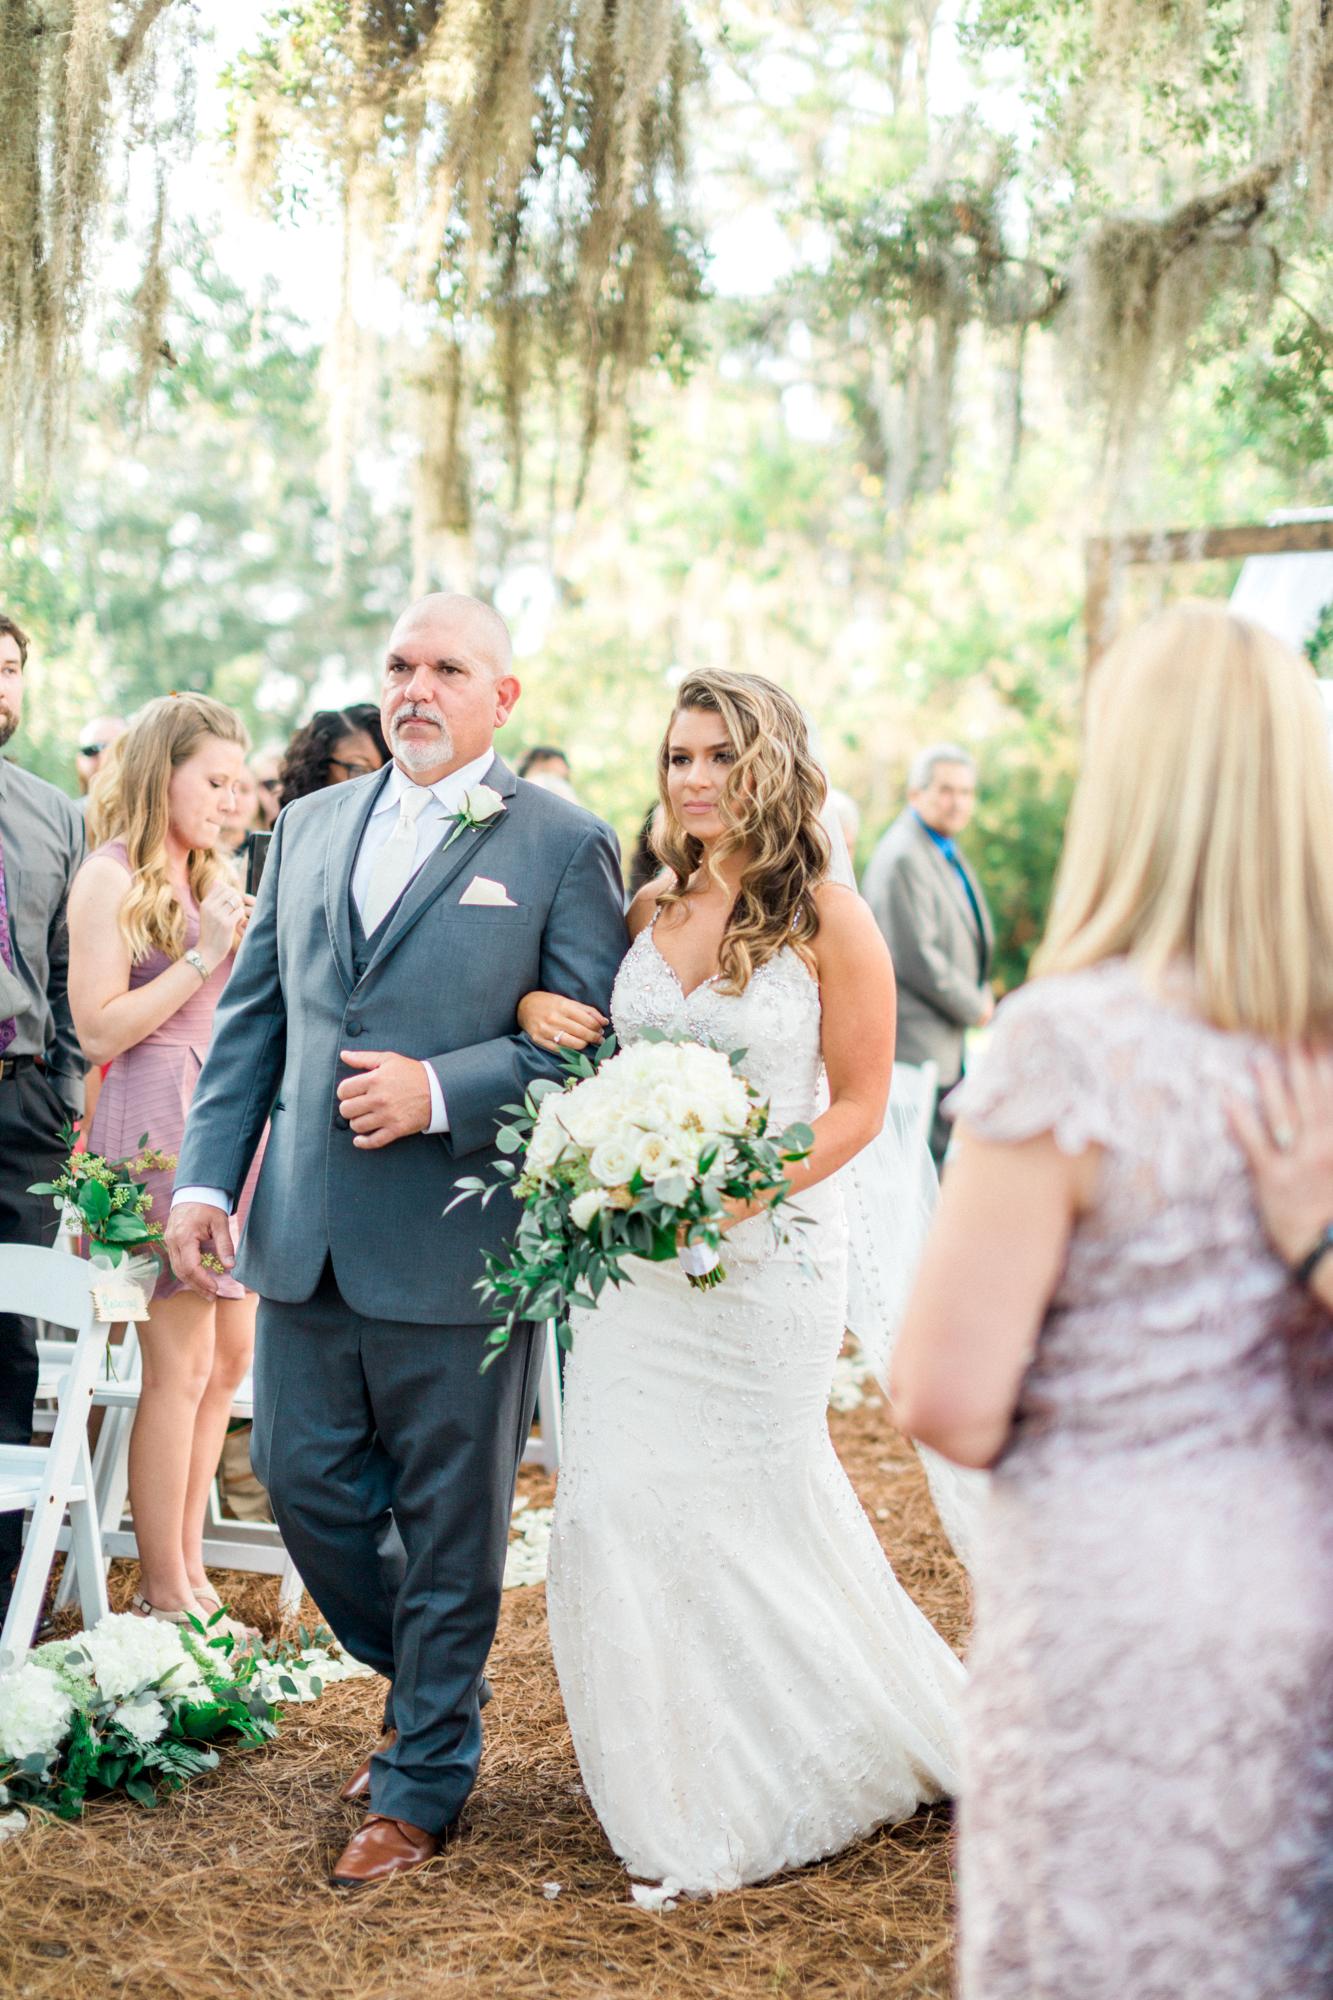 jessica-bellinger-photography-harmony-golf-preserve-wedding-photos-9088.jpg